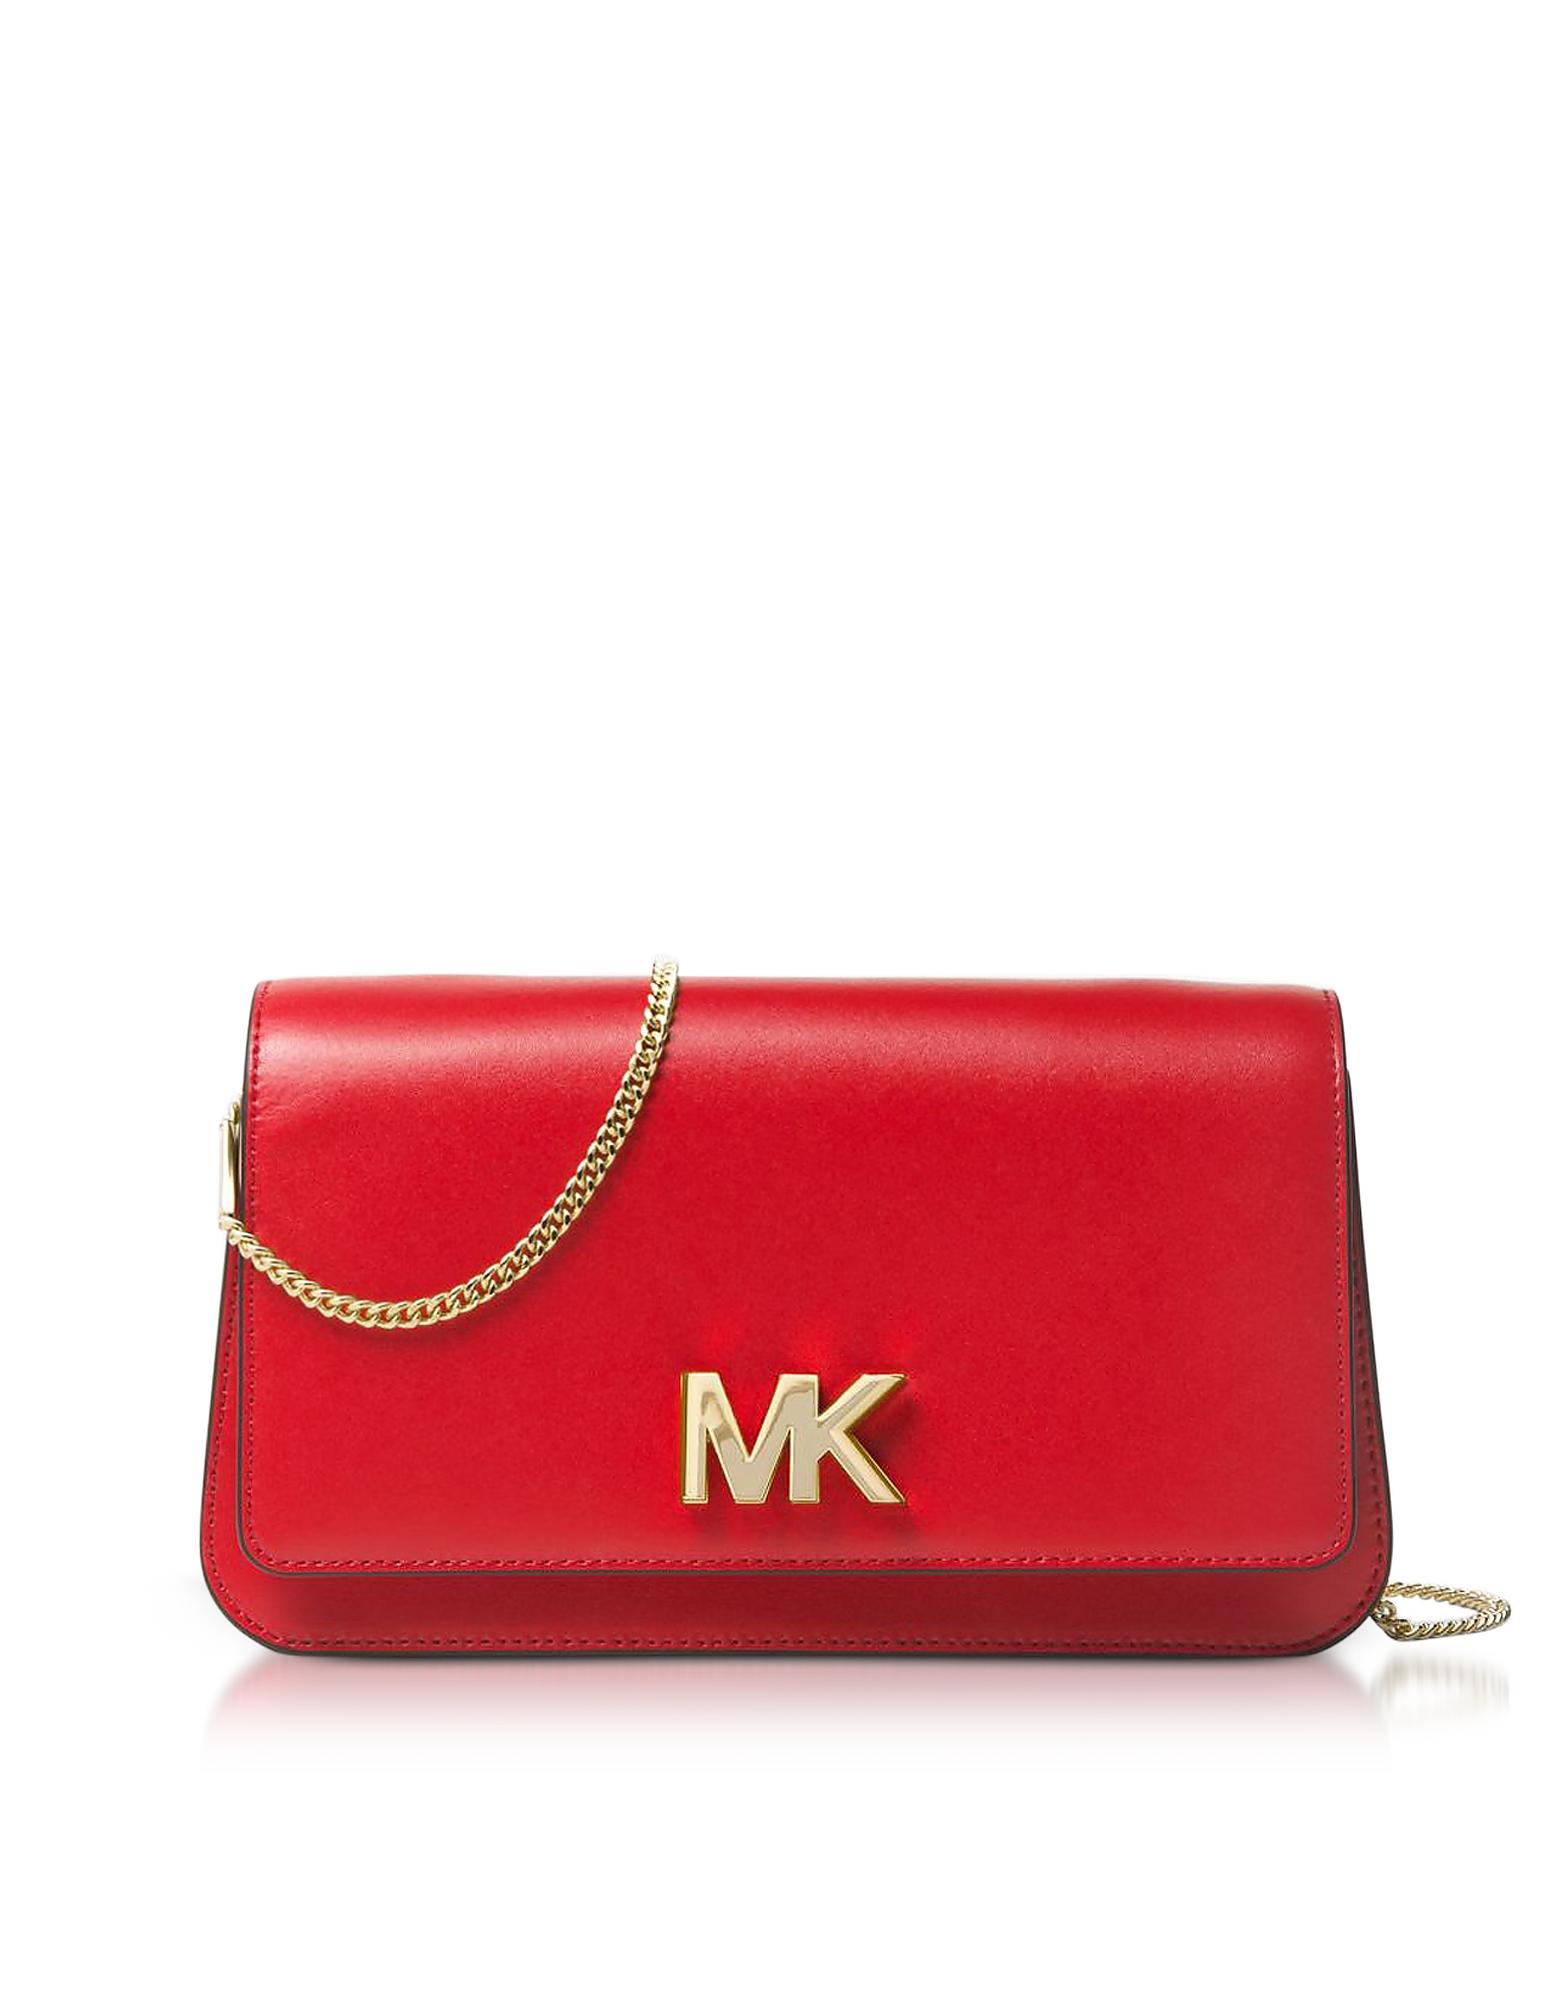 Michael Kors Handbags, Mott Large Bright Red Leather Clutch